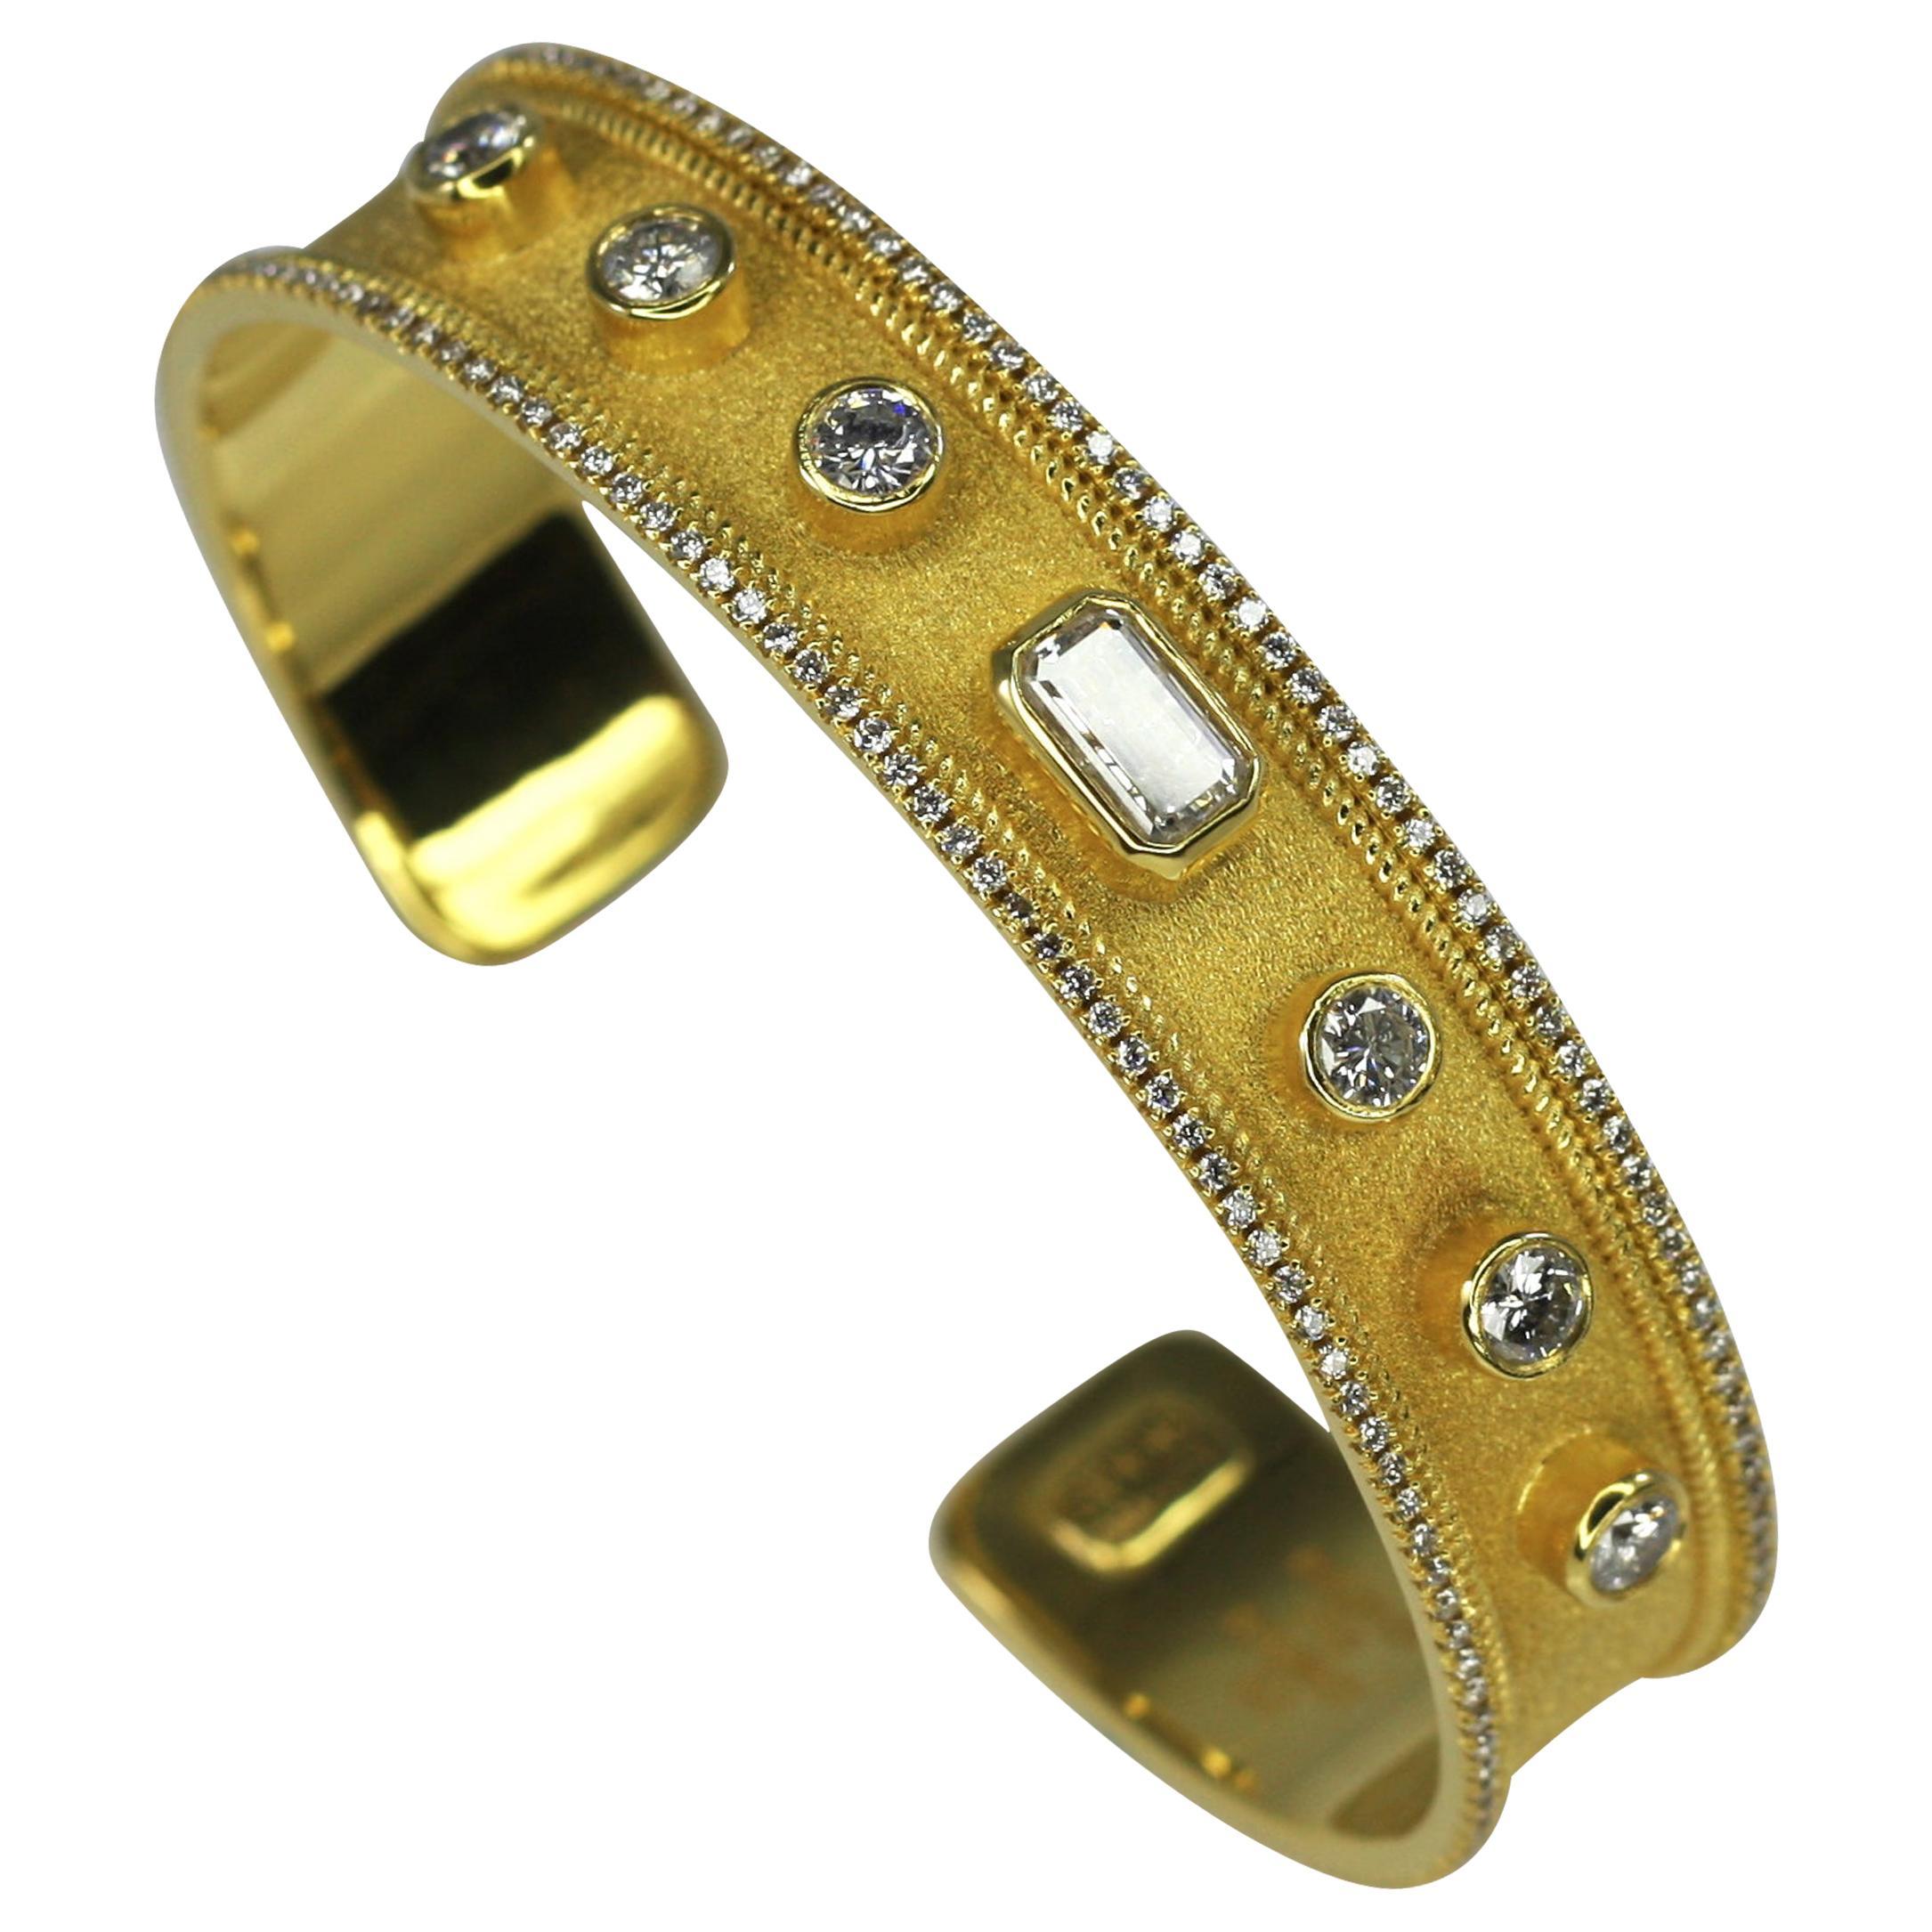 Georgios Collections 18 Karat Yellow Gold Cuff Bracelet with White Diamonds